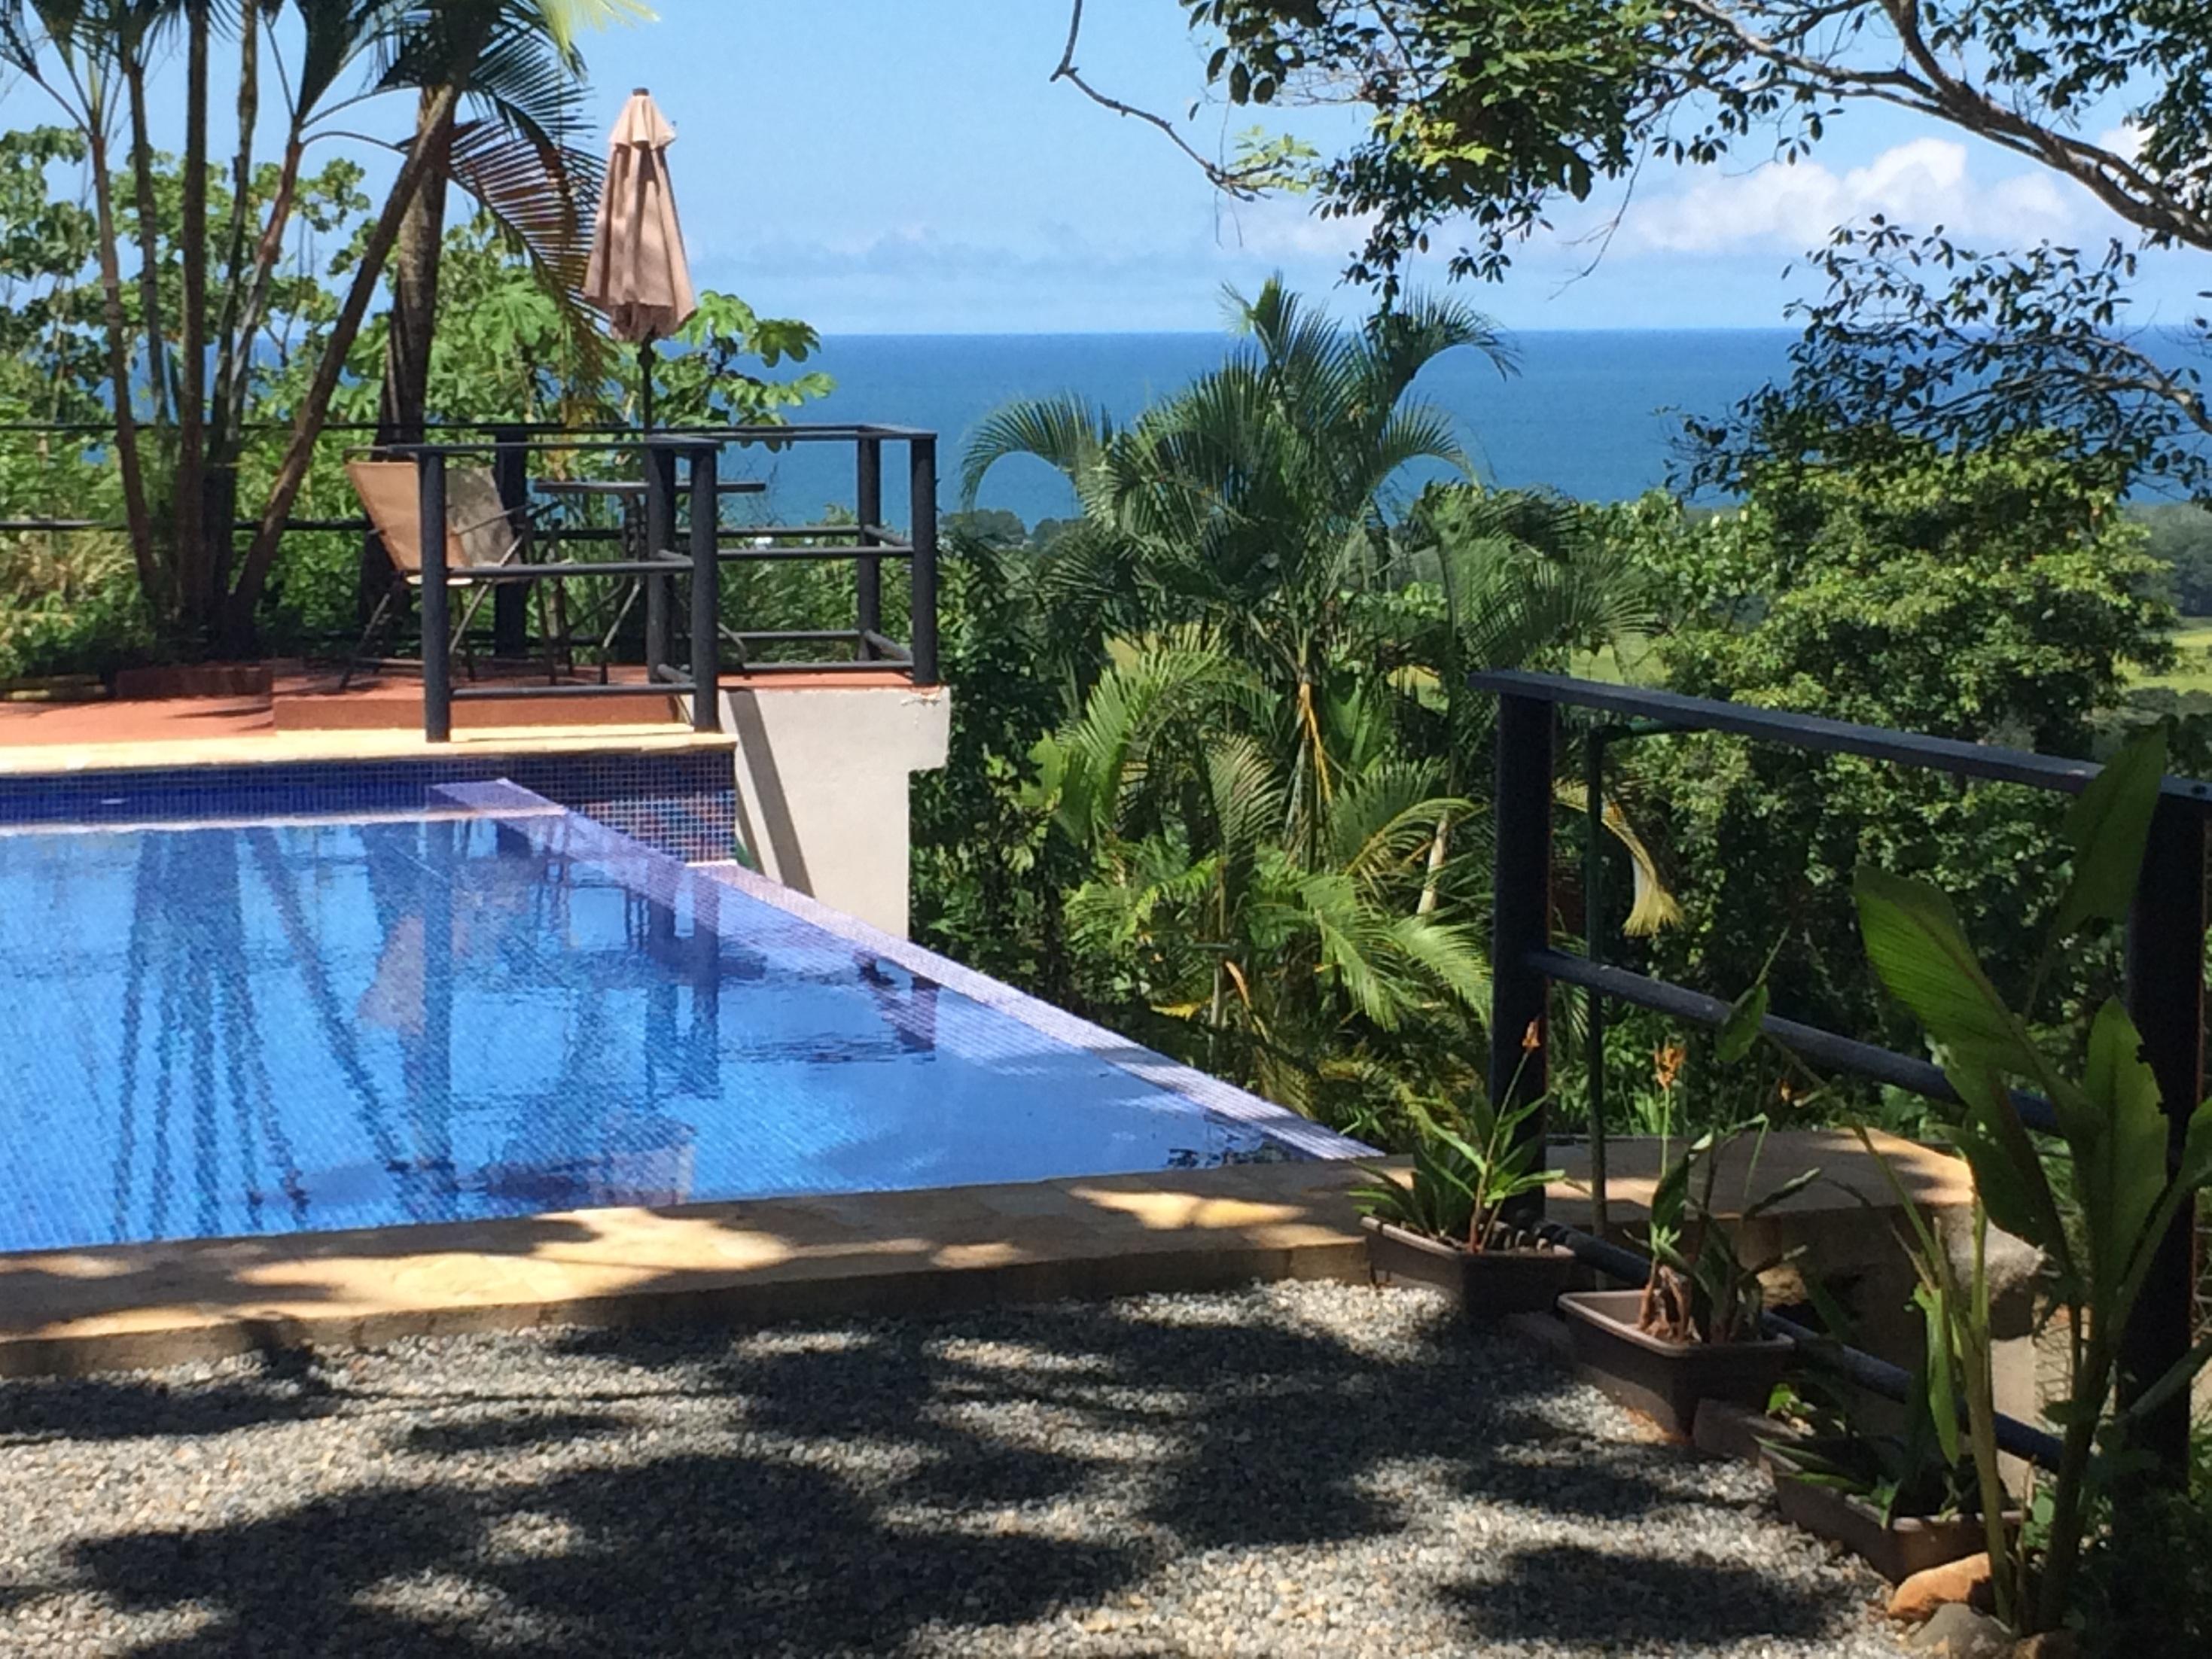 Hatillo-Costa-Rica-property-costaricarealestateHAT087-3.jpg